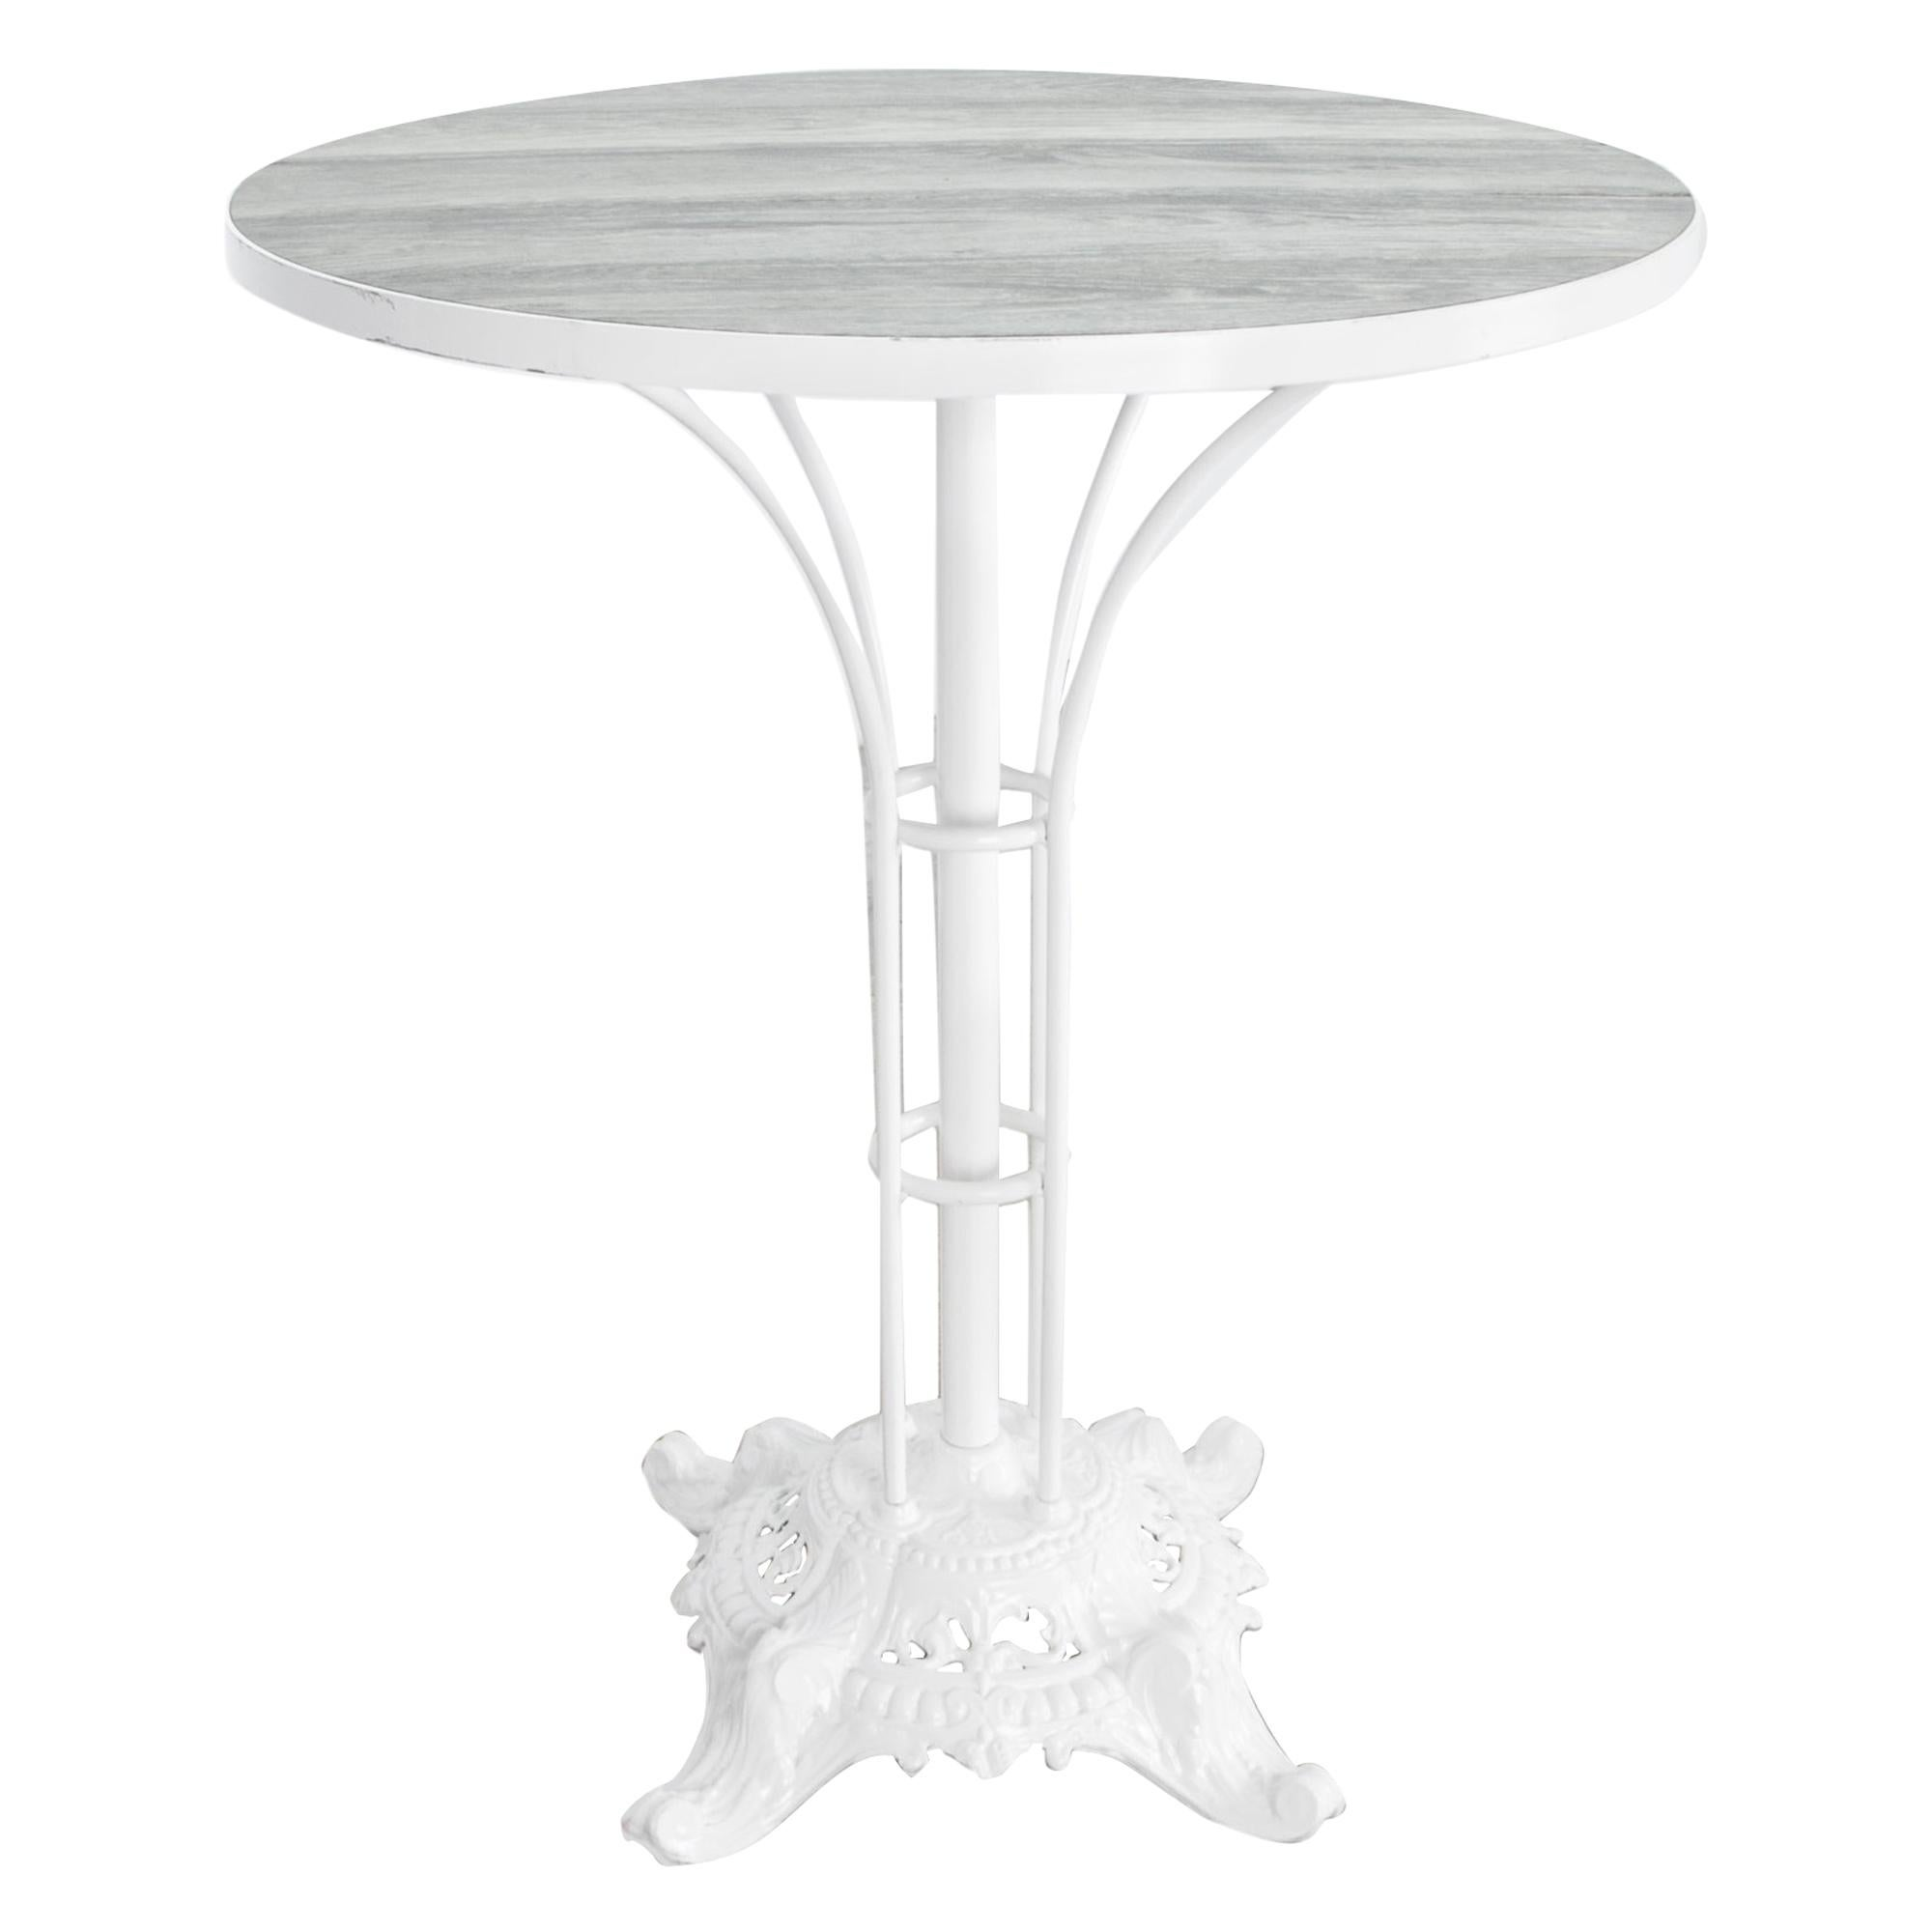 Enamelled Steel Table with Oak Top